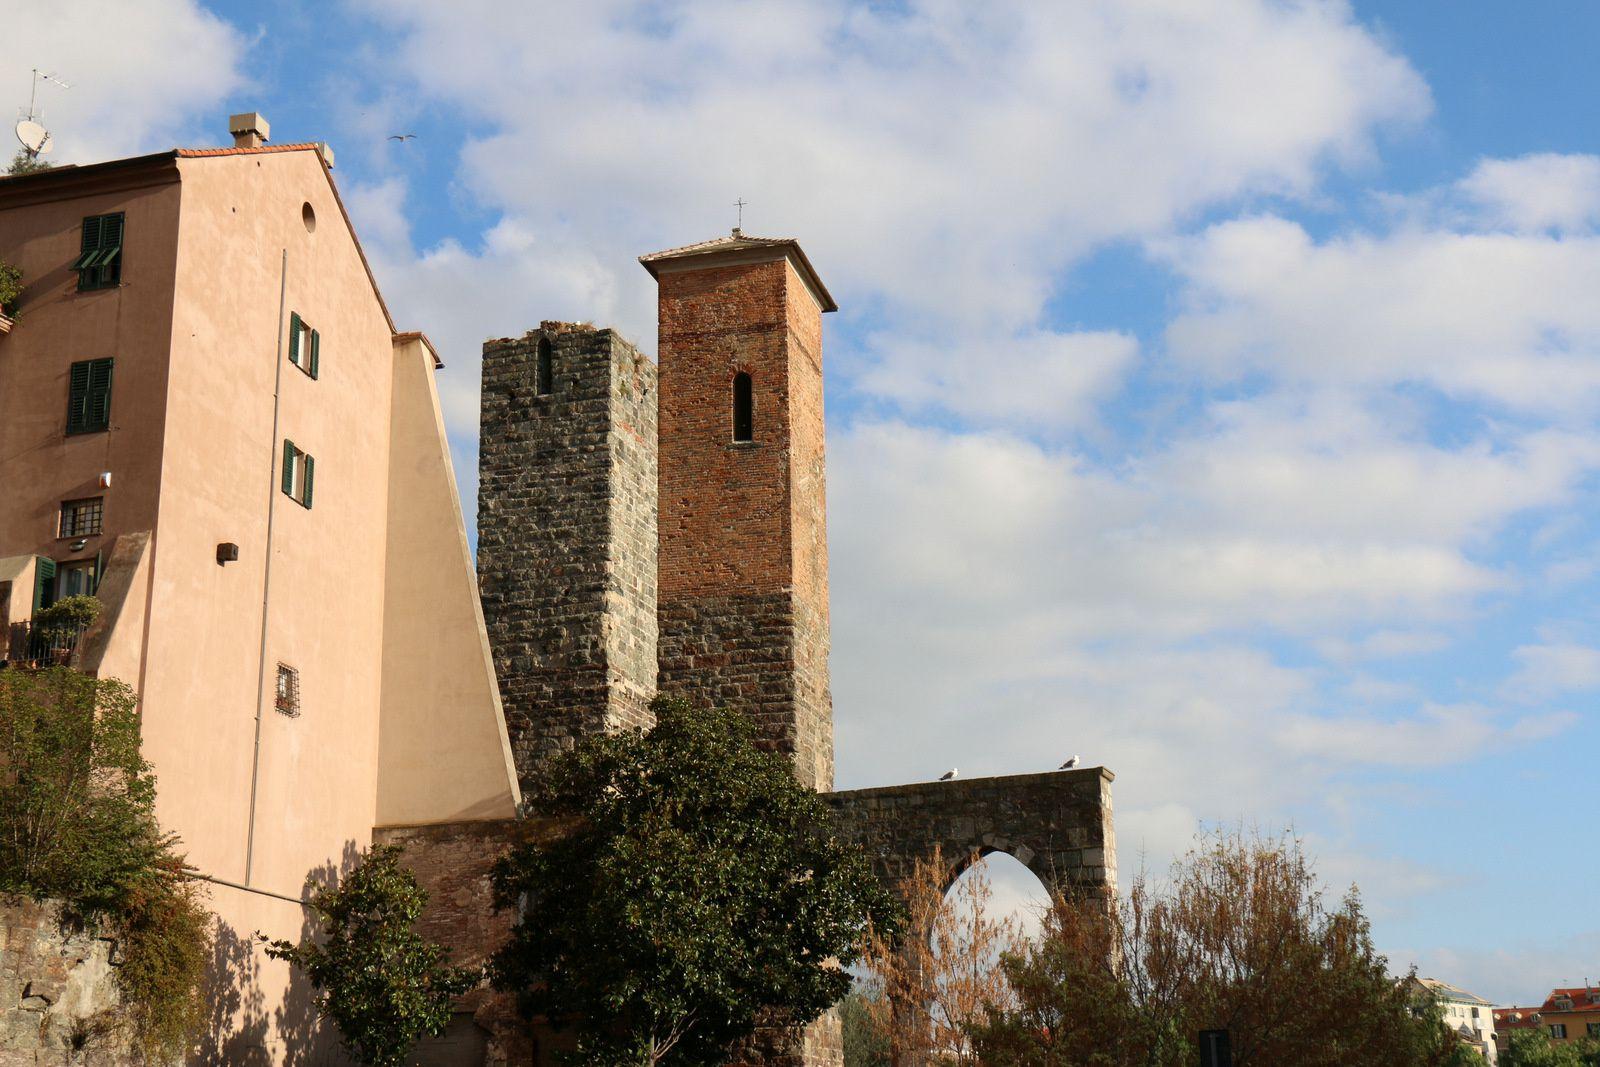 Torre del Brandale, Savone (Italie)